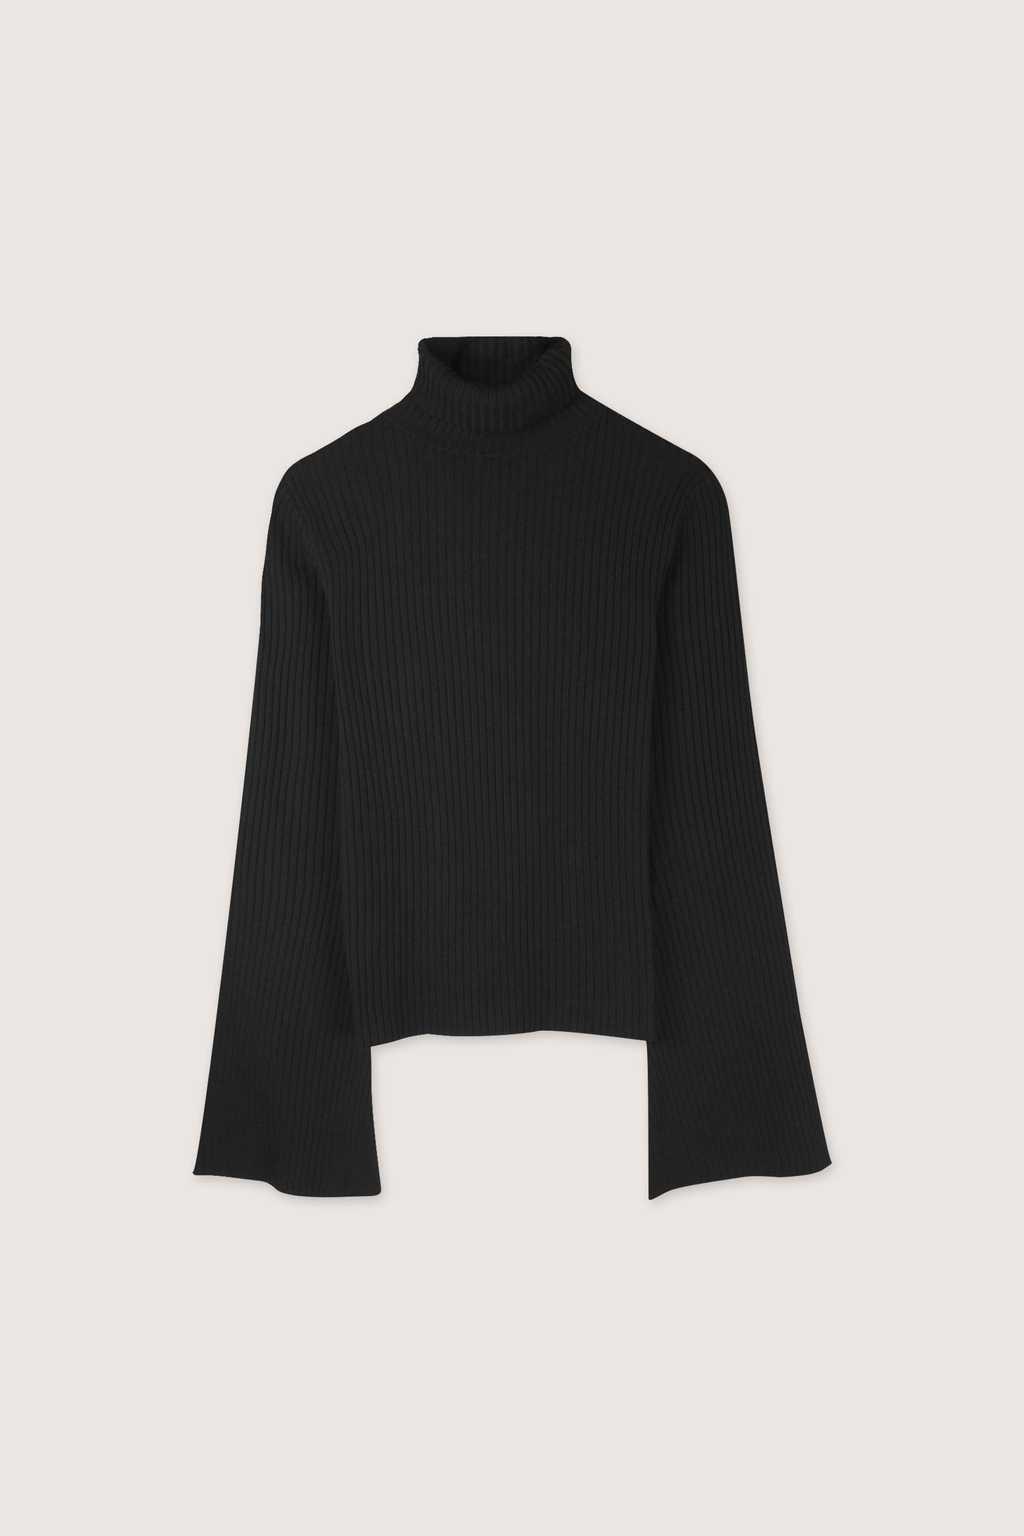 Sweater 1581 Black 9